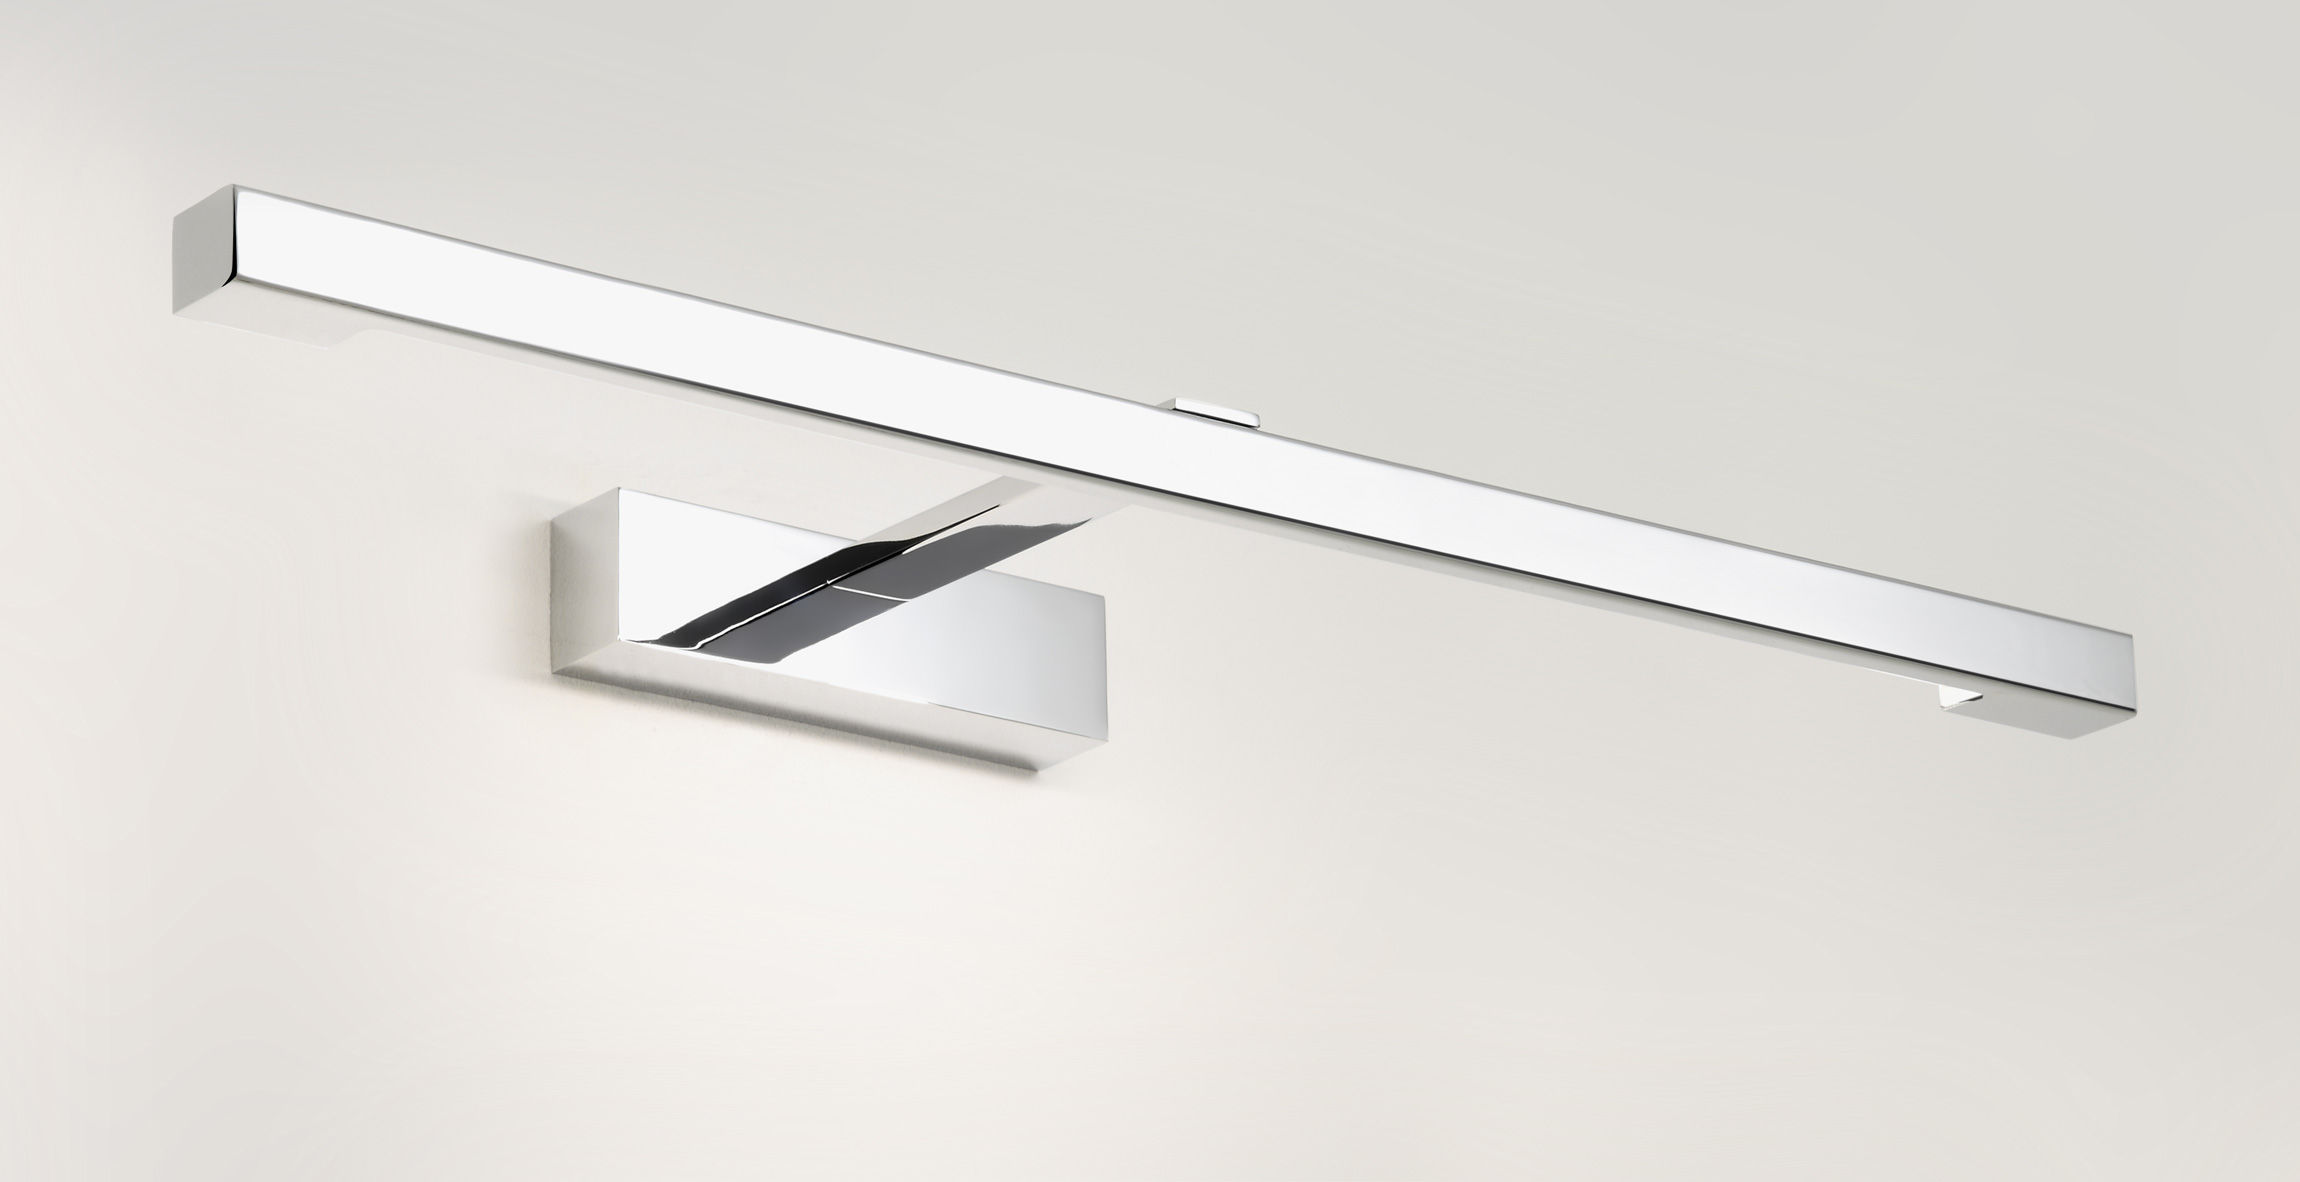 Modern Led Bathroom Ceiling Light Chrome Finish Ip44 Rated: Astro Kashima 620 0961 Bathroom Wall Mirror Light Chrome